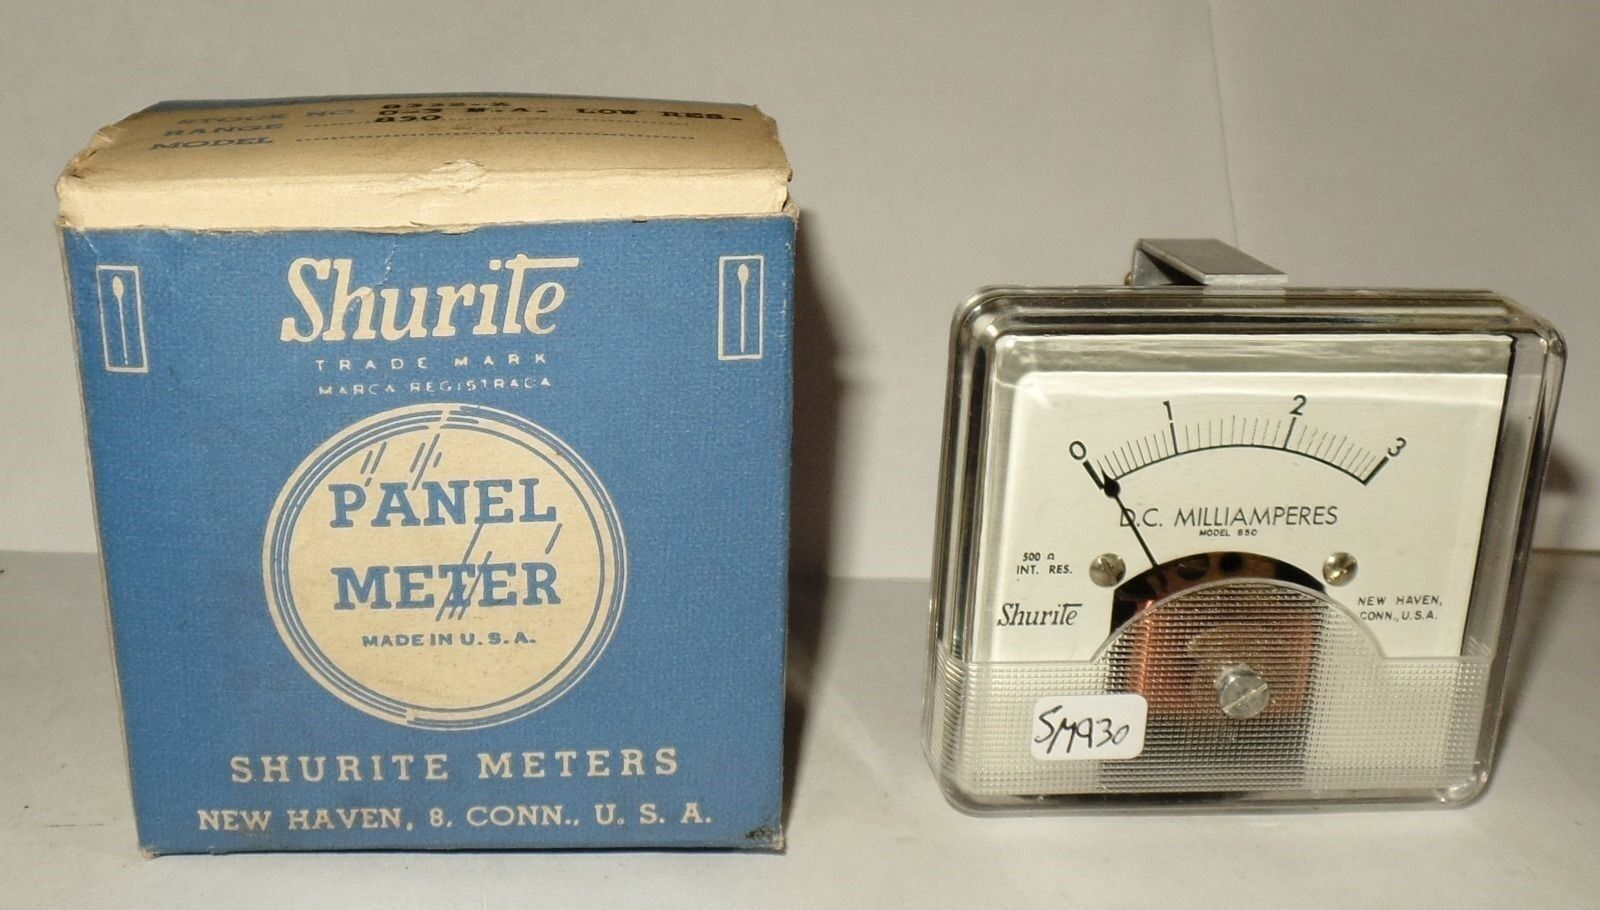 Nos-Nib Shurite Dc Quadrata Pannello Metro Amperometro Milli Amplificatori